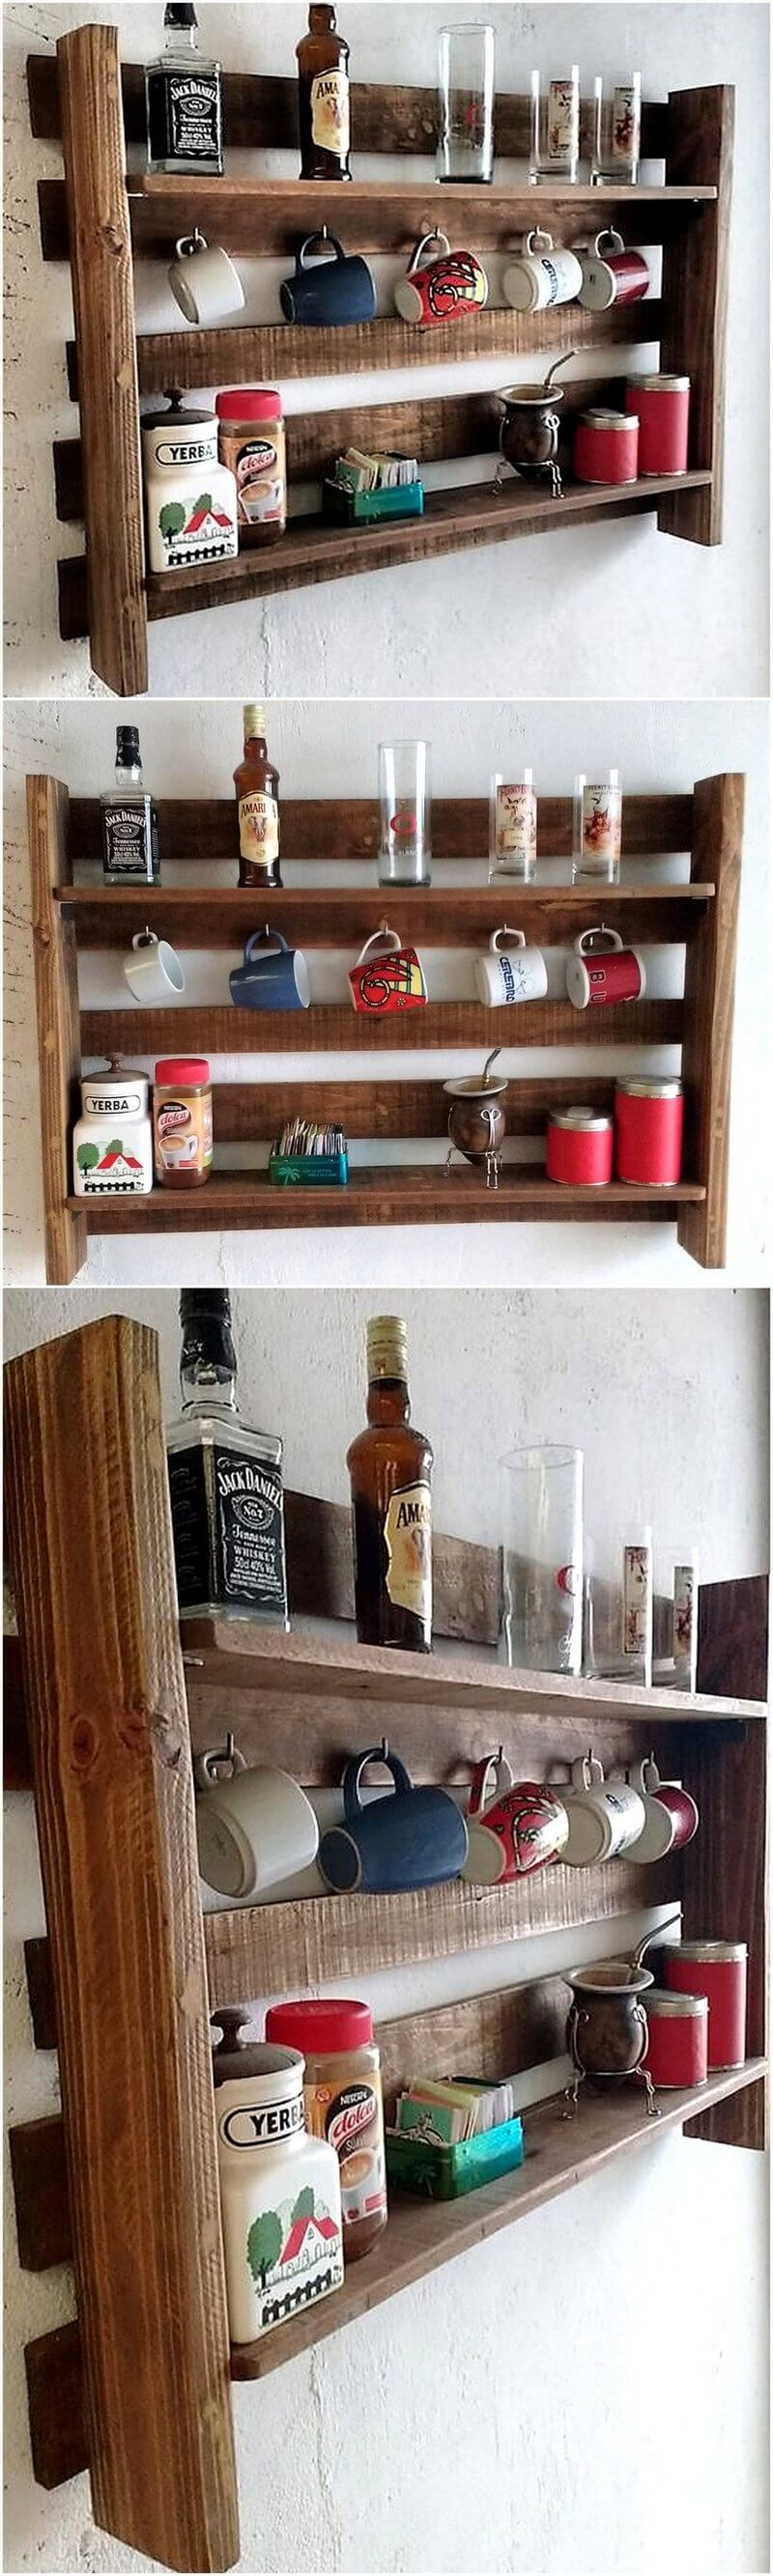 wood pallet rustic kitchen shelf